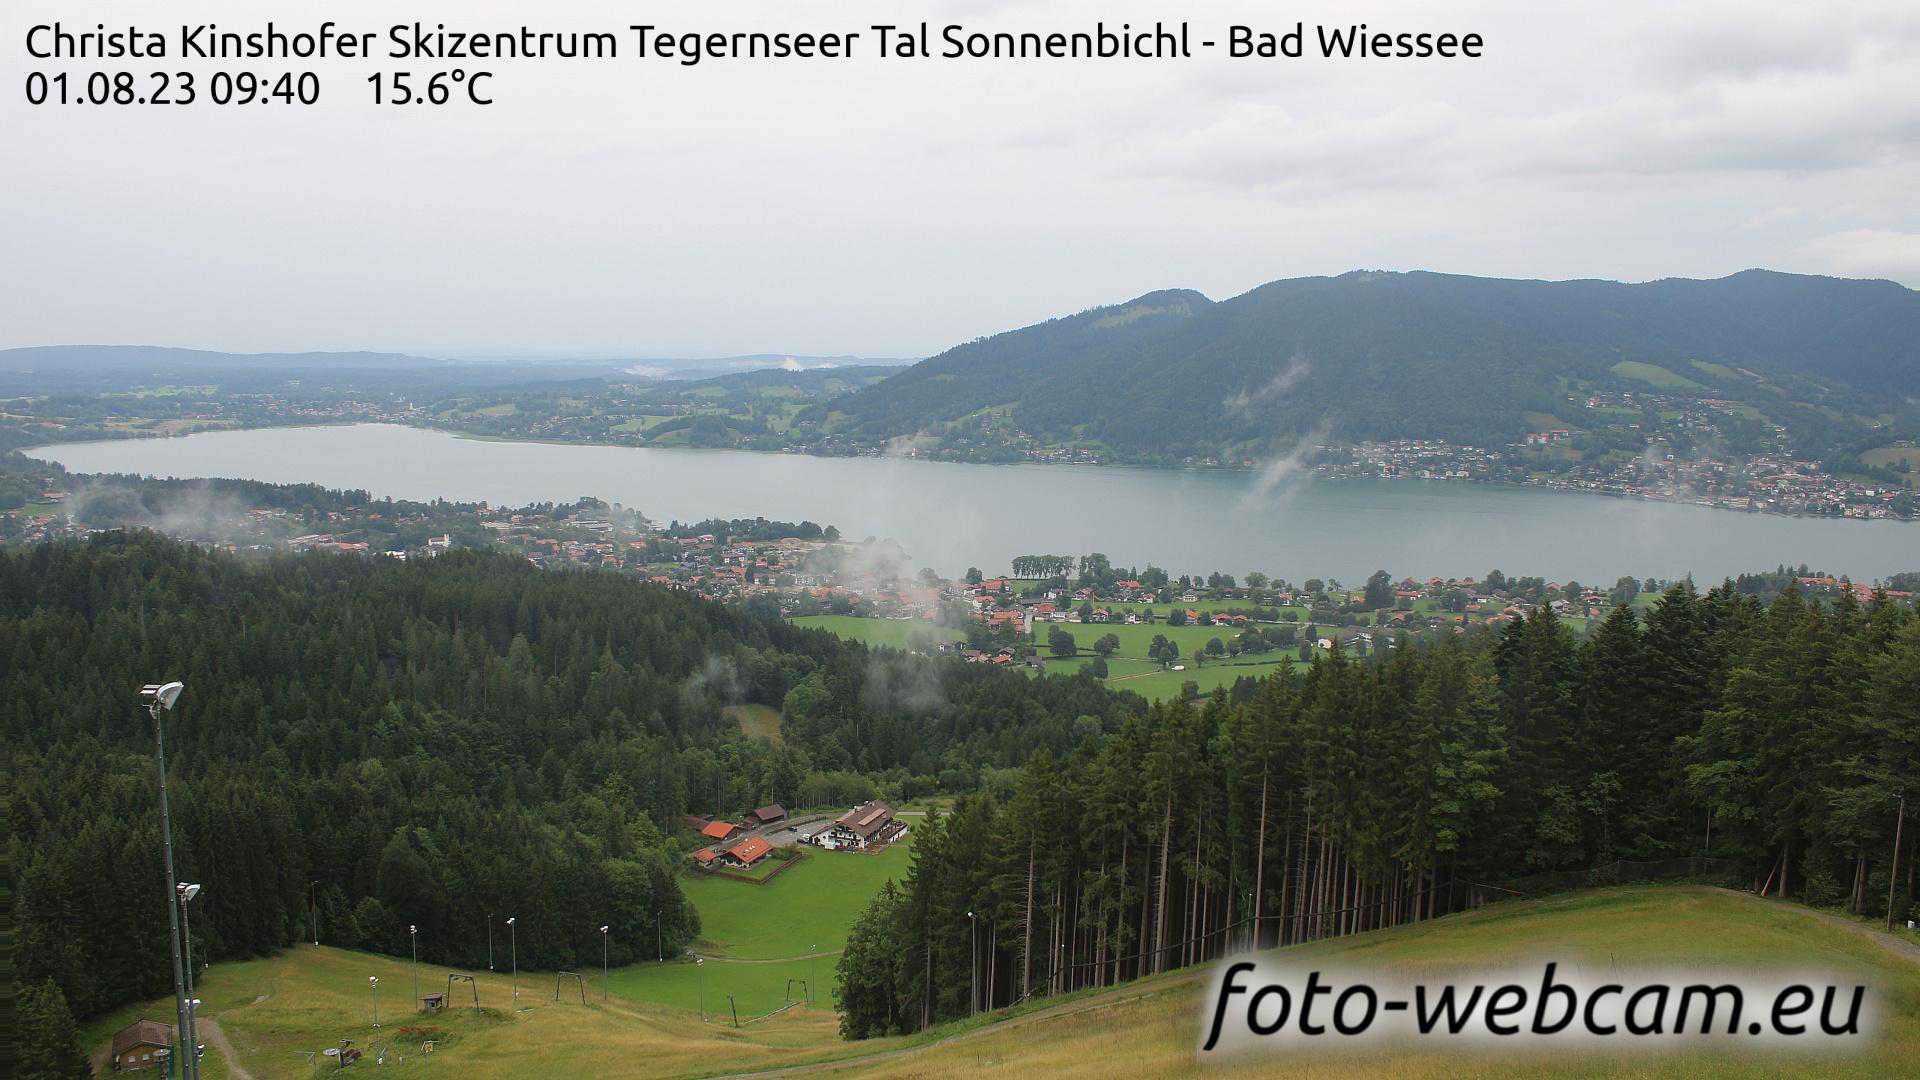 Bad Wiessee Tue. 09:48